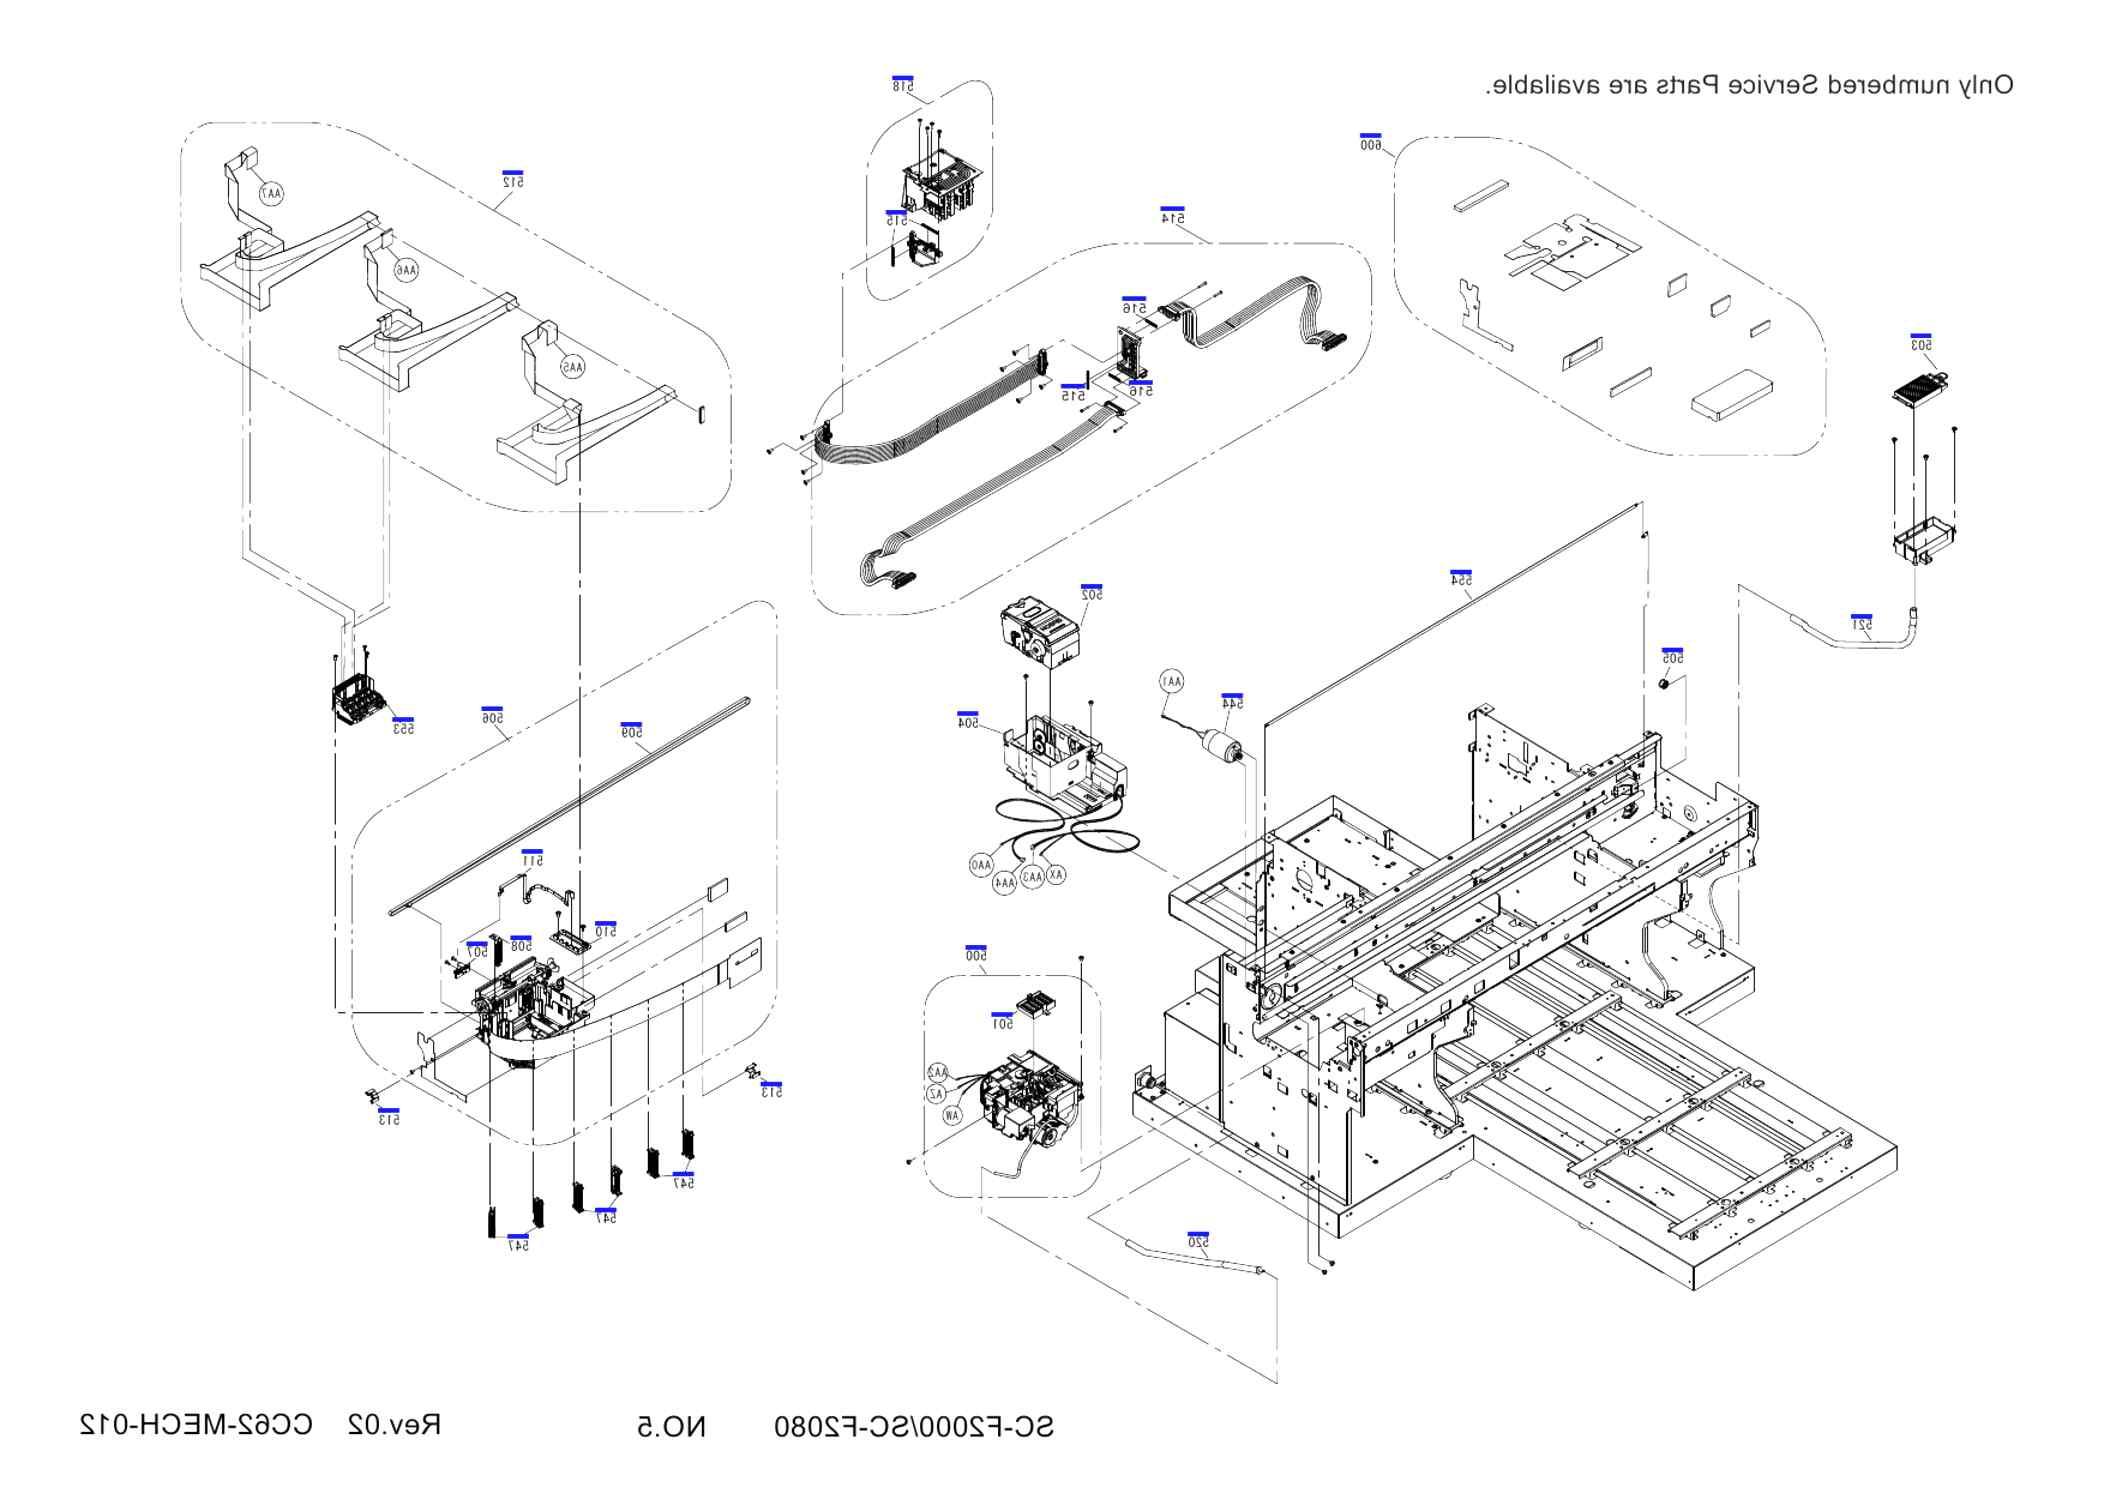 Epson 2000 Printer for sale| 45 used Epson 2000 Printers